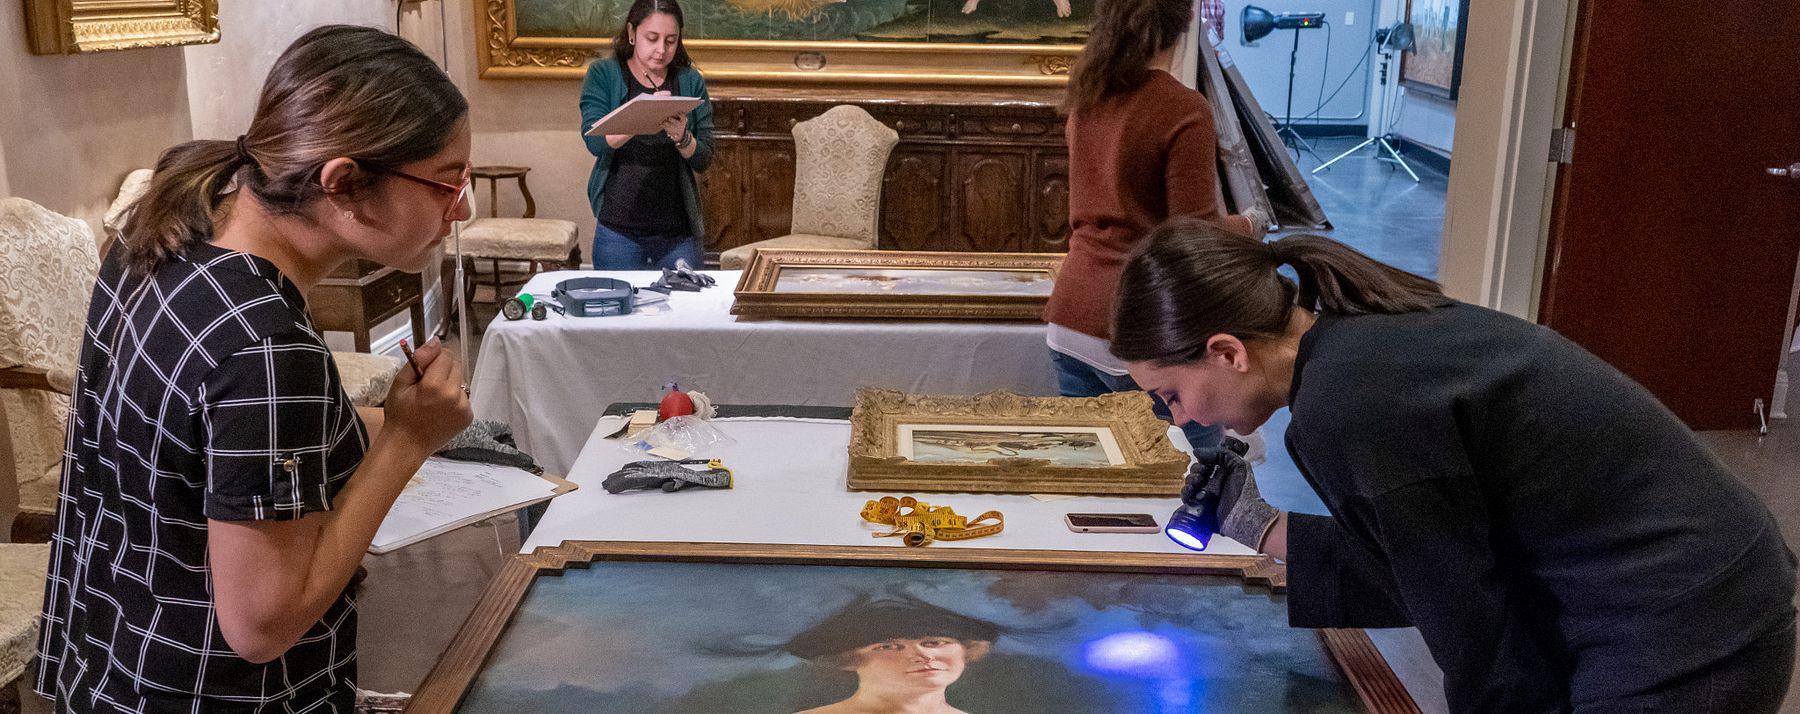 Students inspect fine artwork.